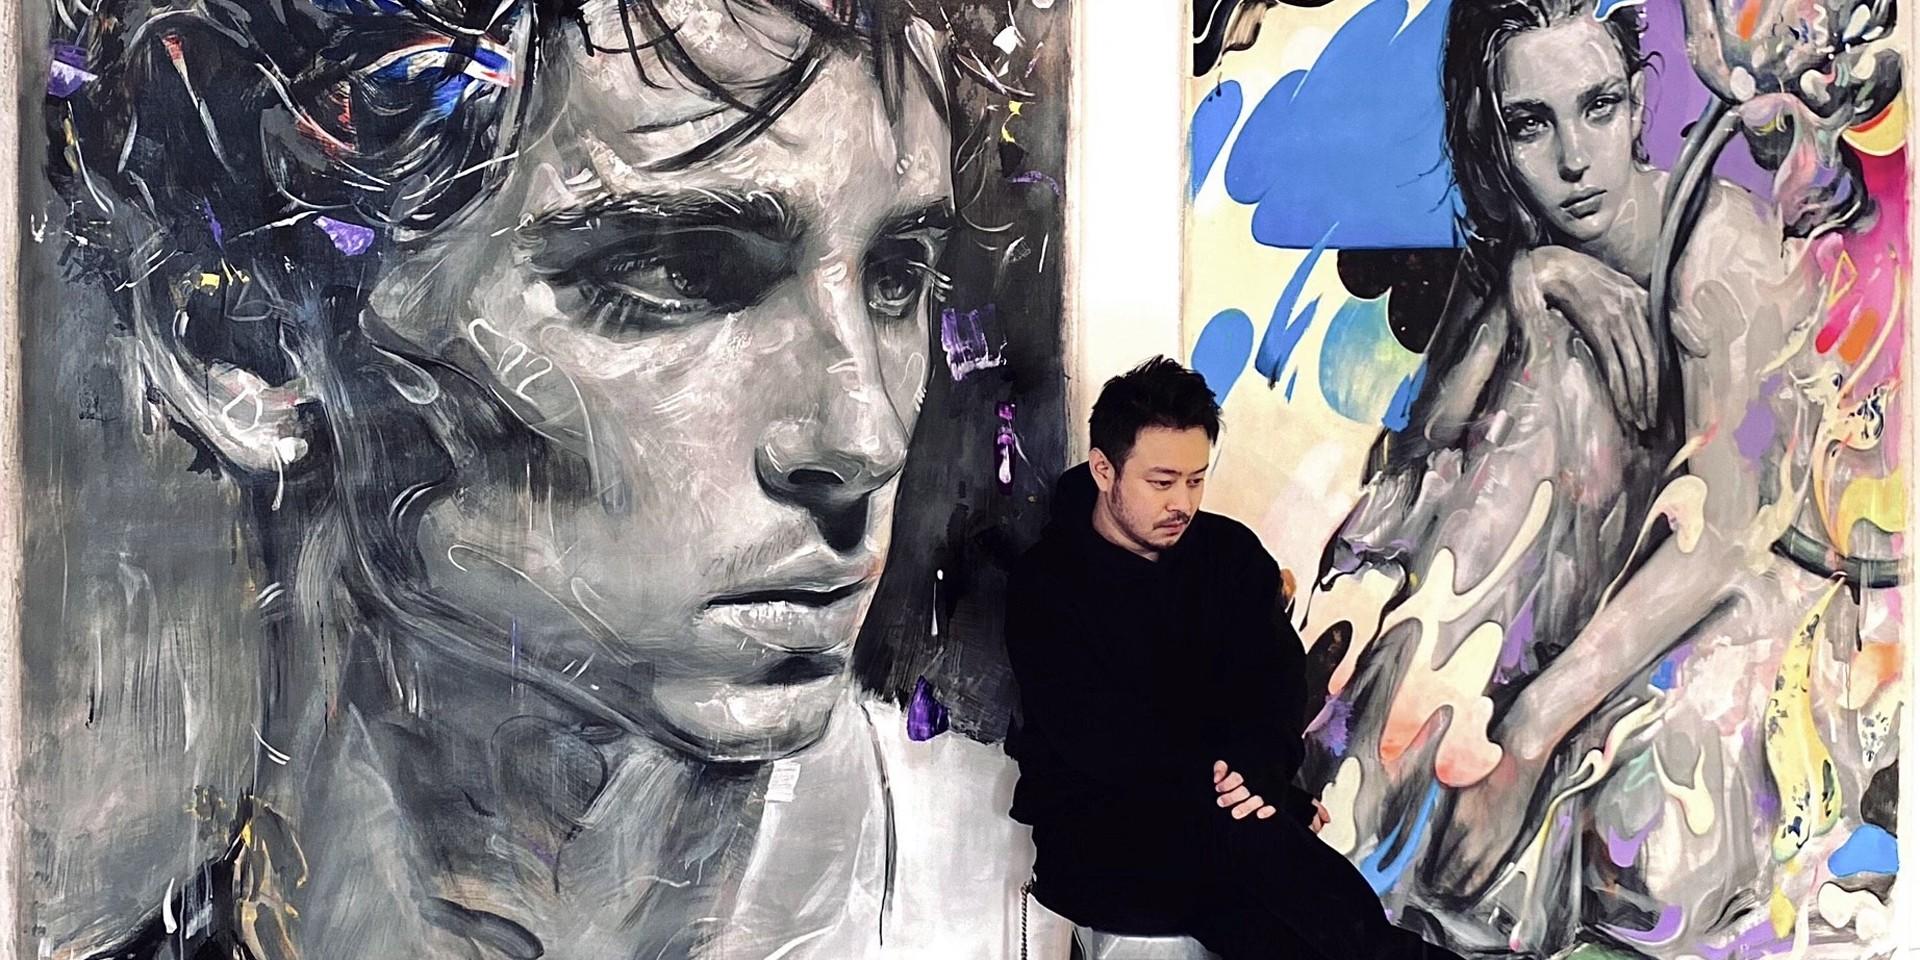 Meet Kildren, the visual artist who found healing from heartbreak through creating BTS portraits